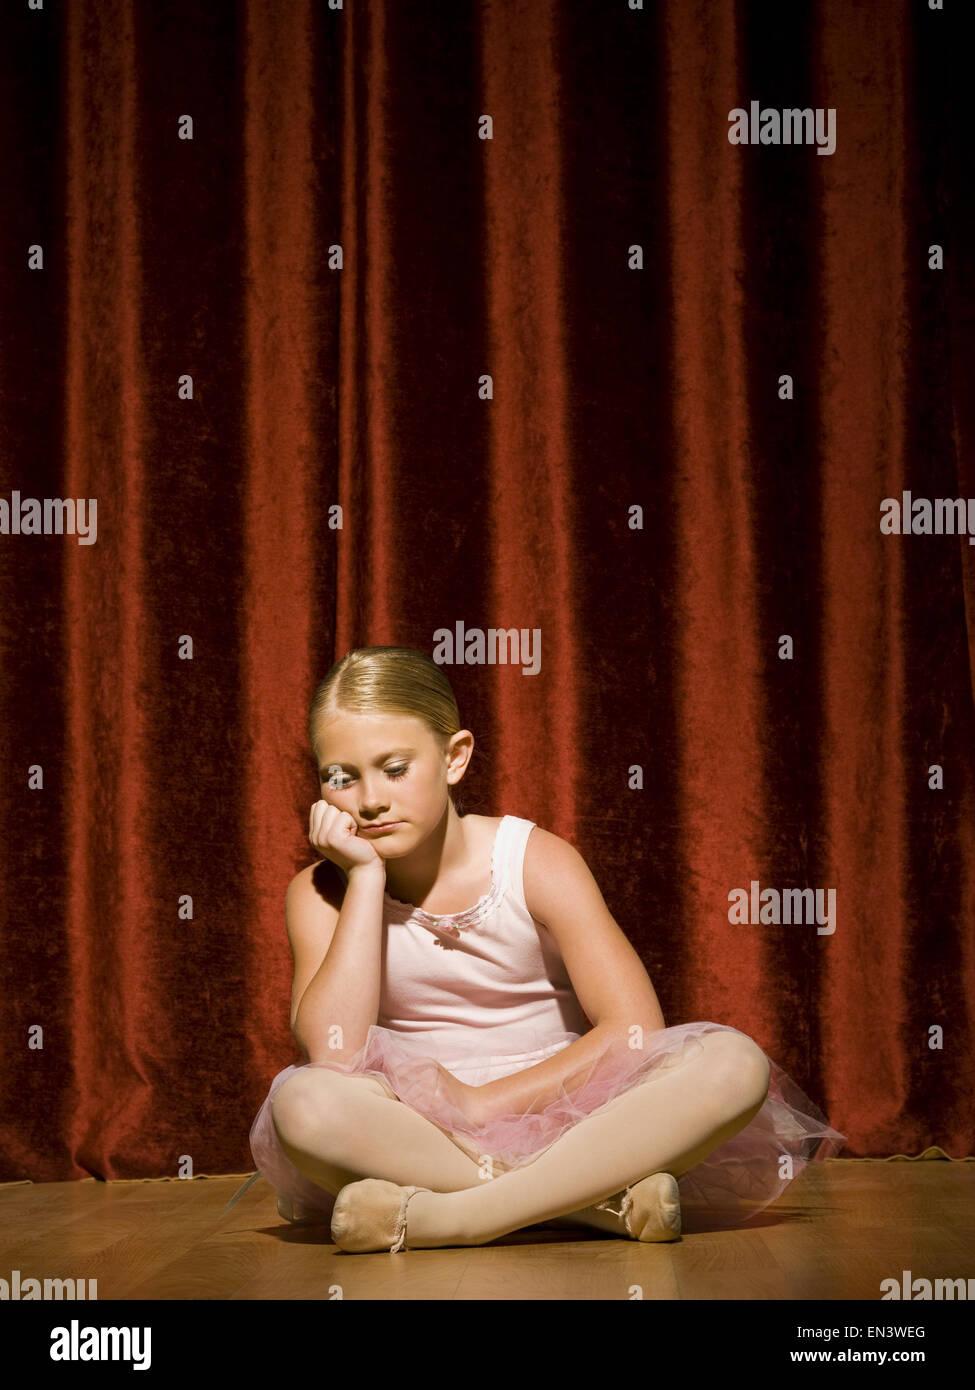 Ballerina girl sitting on stage sulking - Stock Image